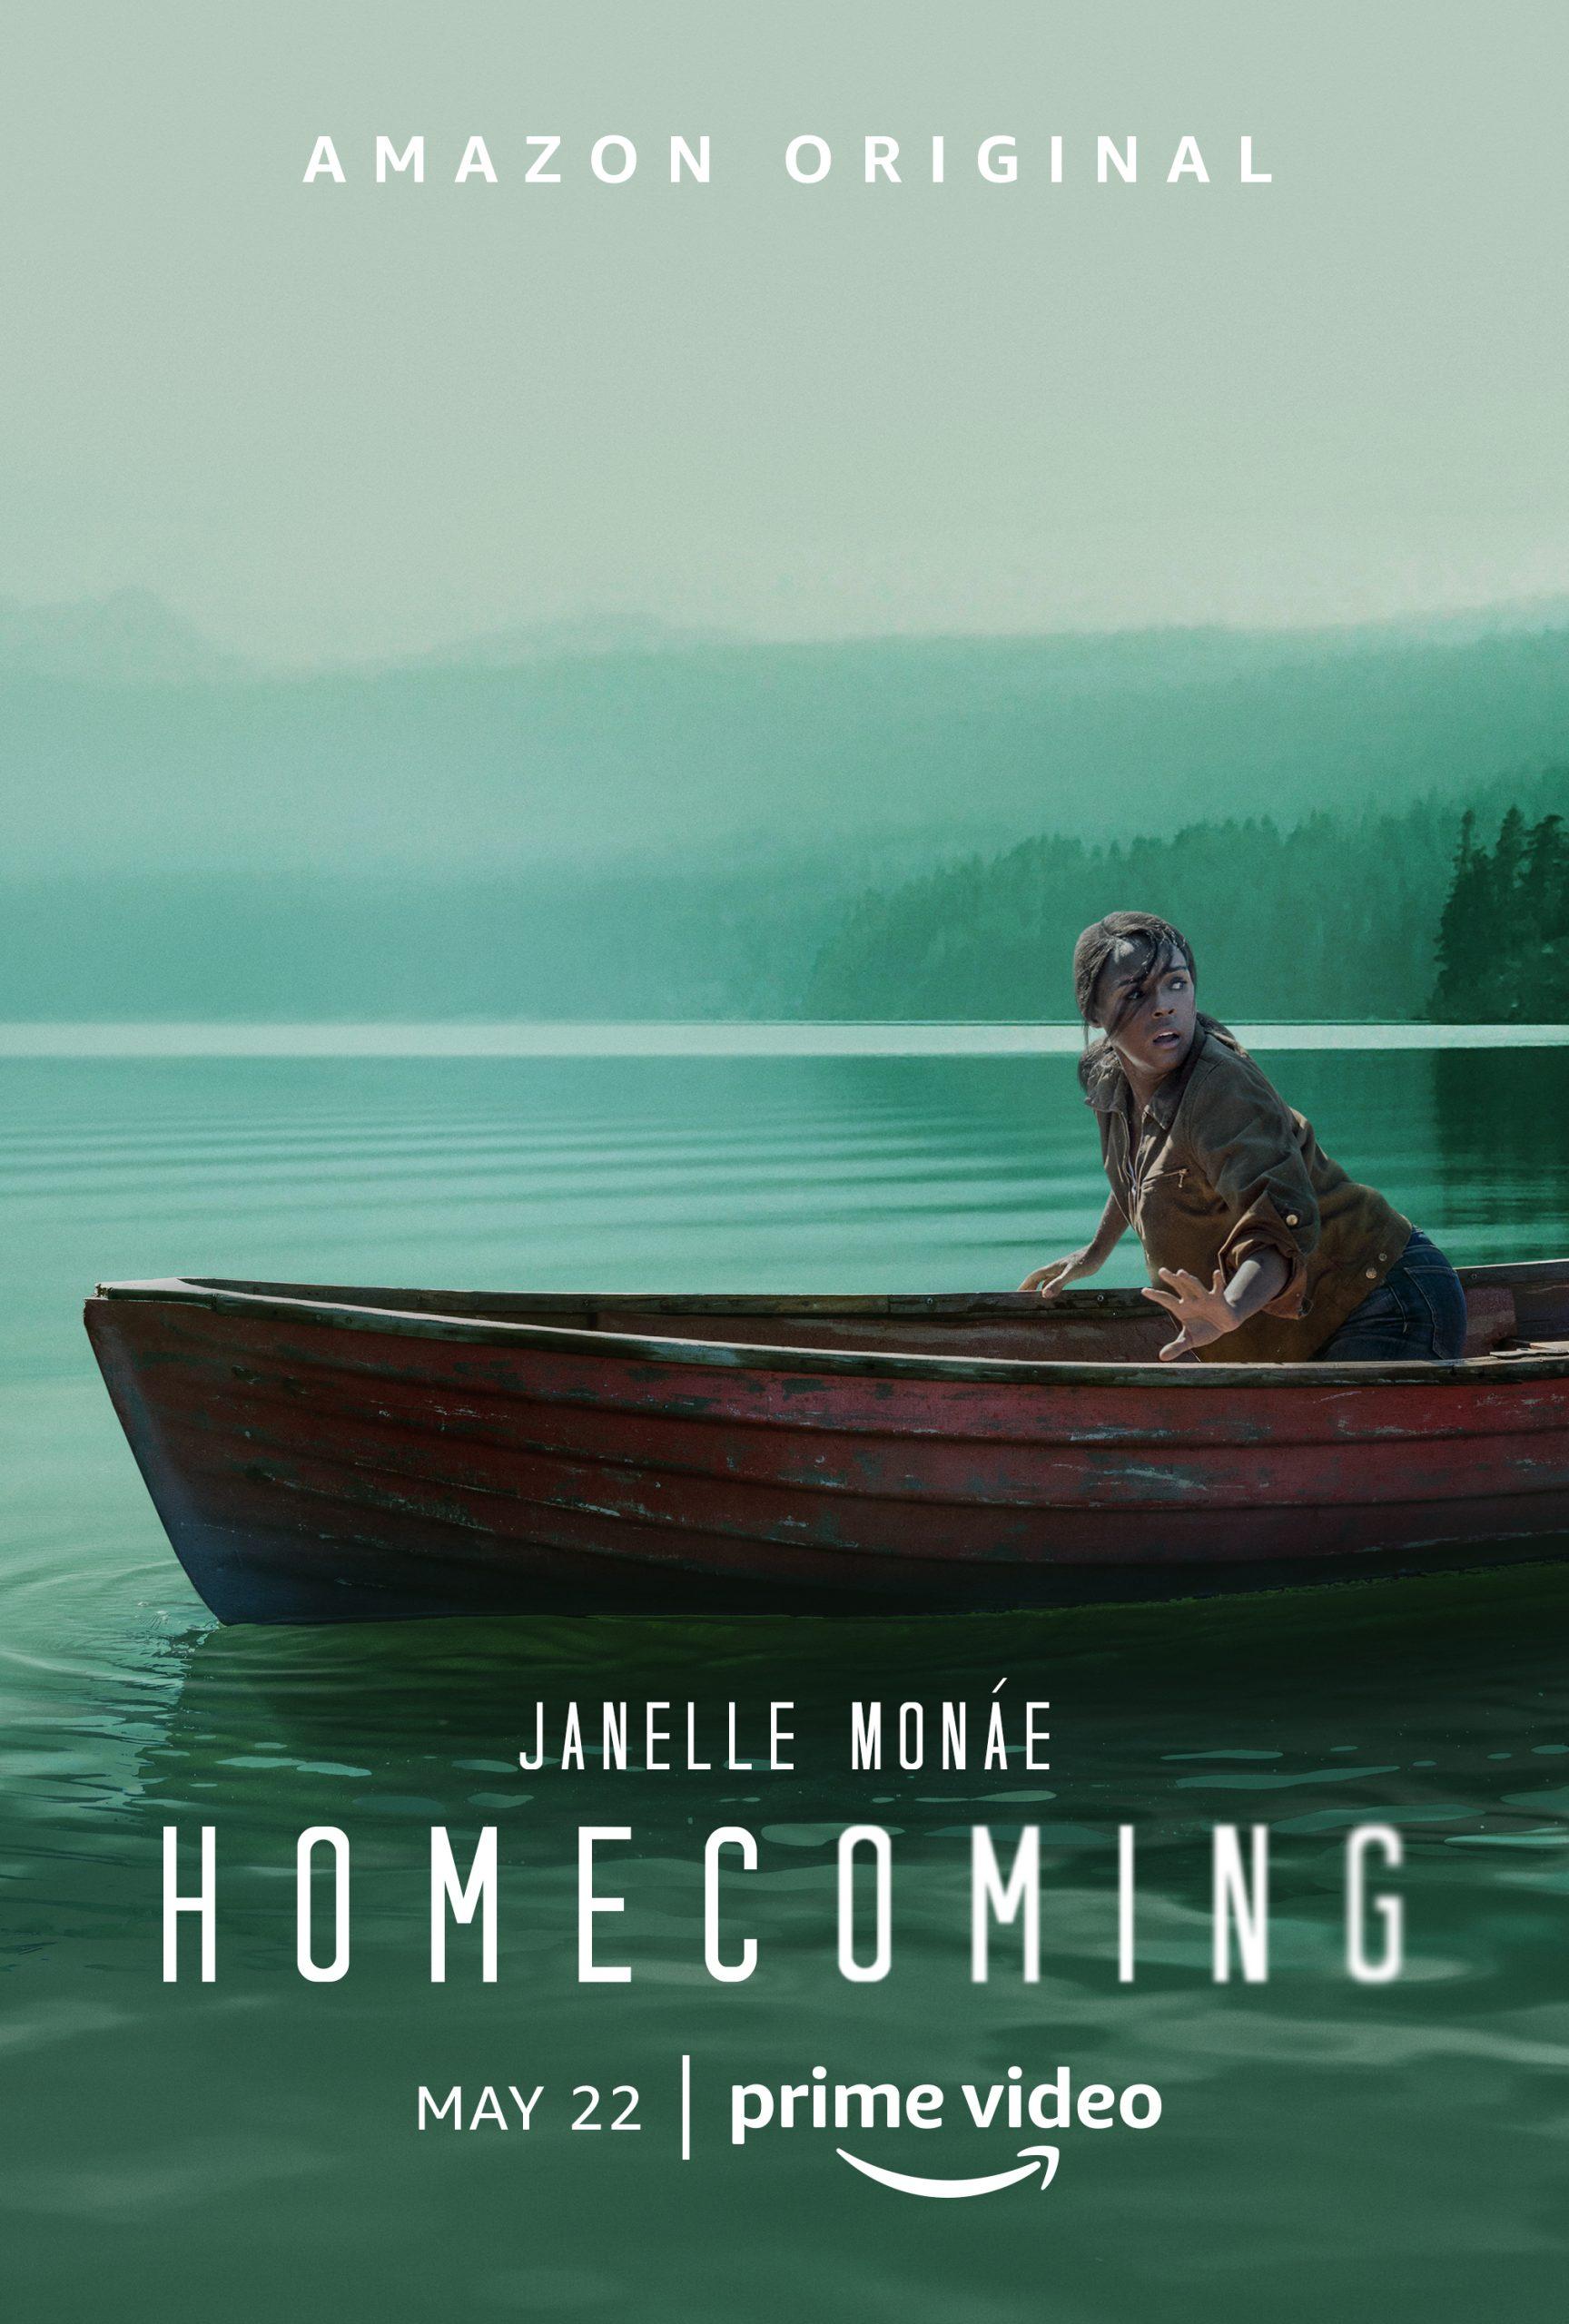 New Show: Homecoming Season 2 Starring Janelle Monae